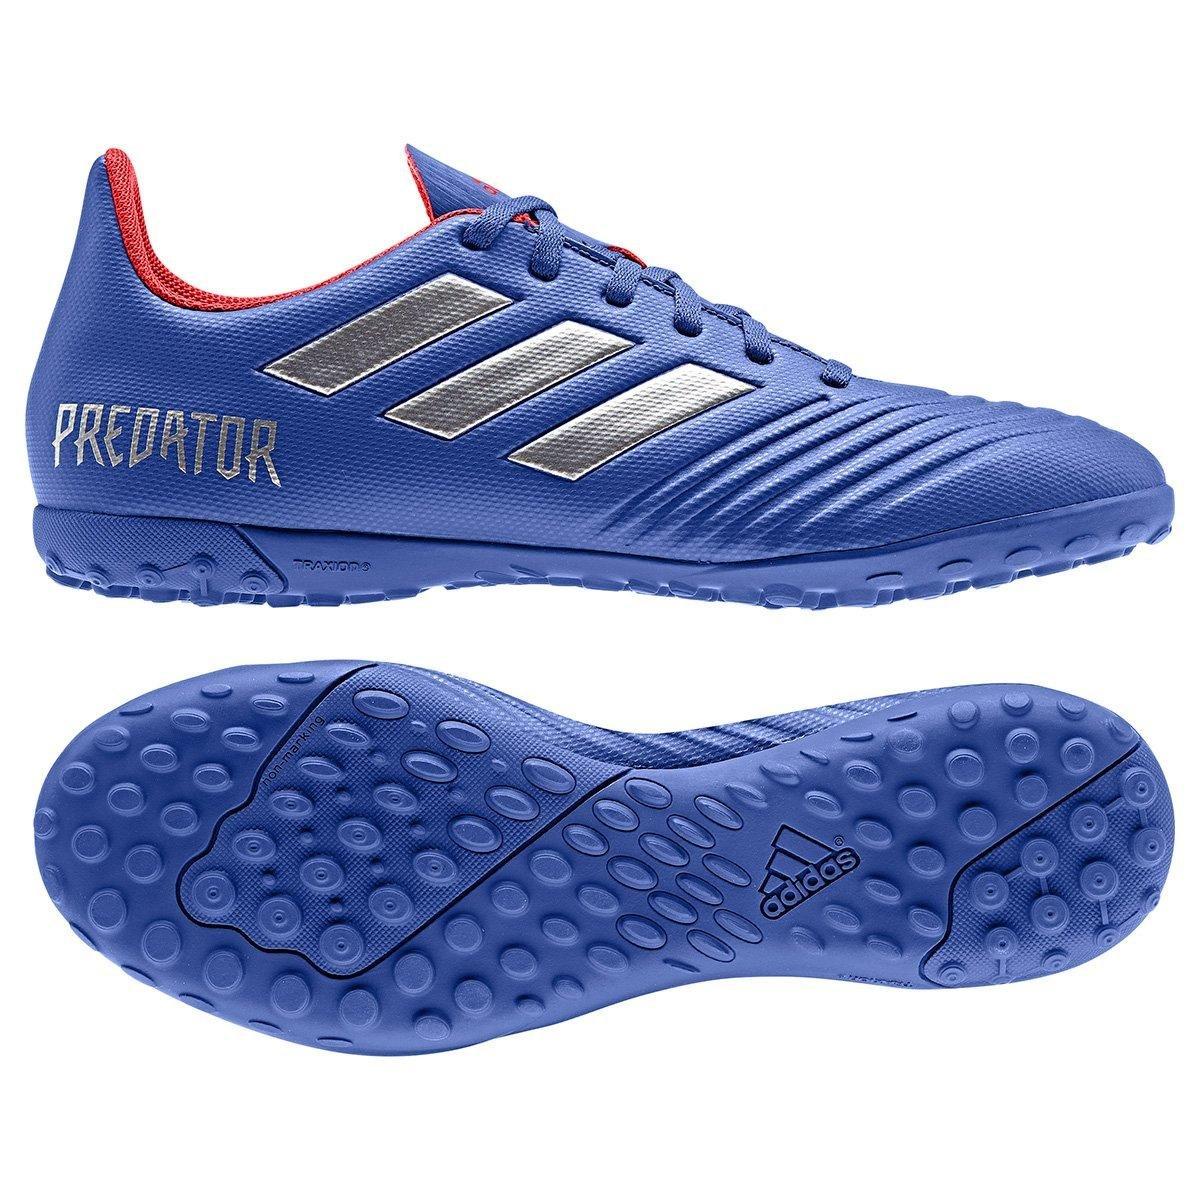 Chuteira Society Adidas Predator 19 4 TF - Azul e Prata - Compre ... 17c89b0aef226